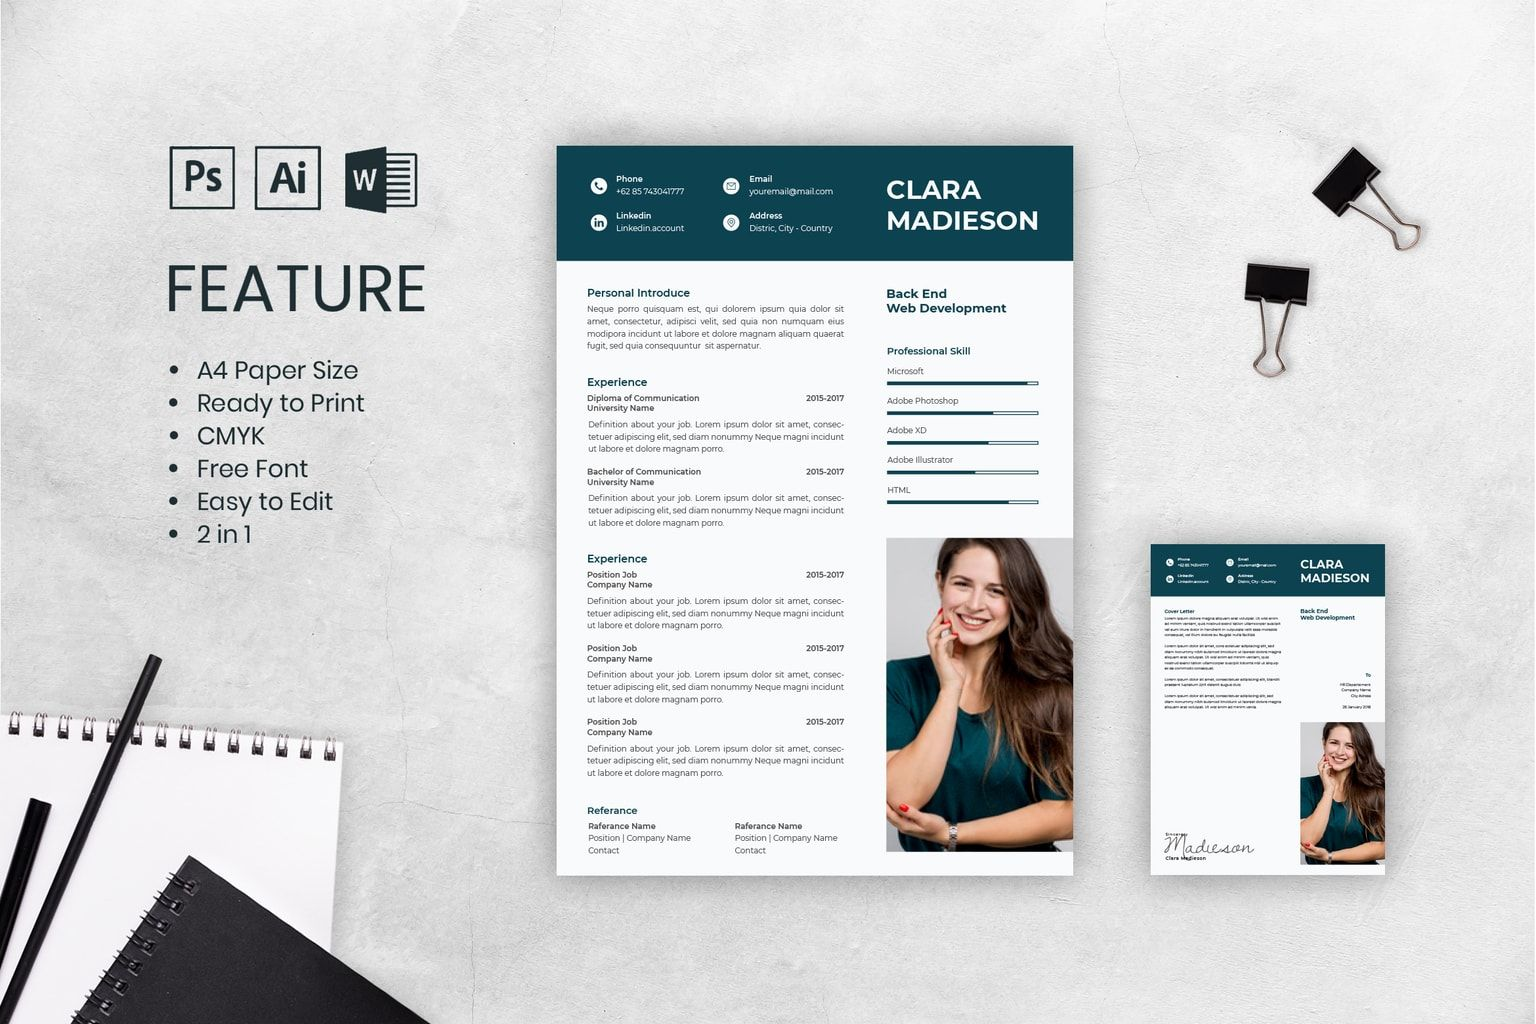 Free Best Fashion Resume Cv Template In Photoshop Psd Desain Cv Cv Kreatif Desain Resume